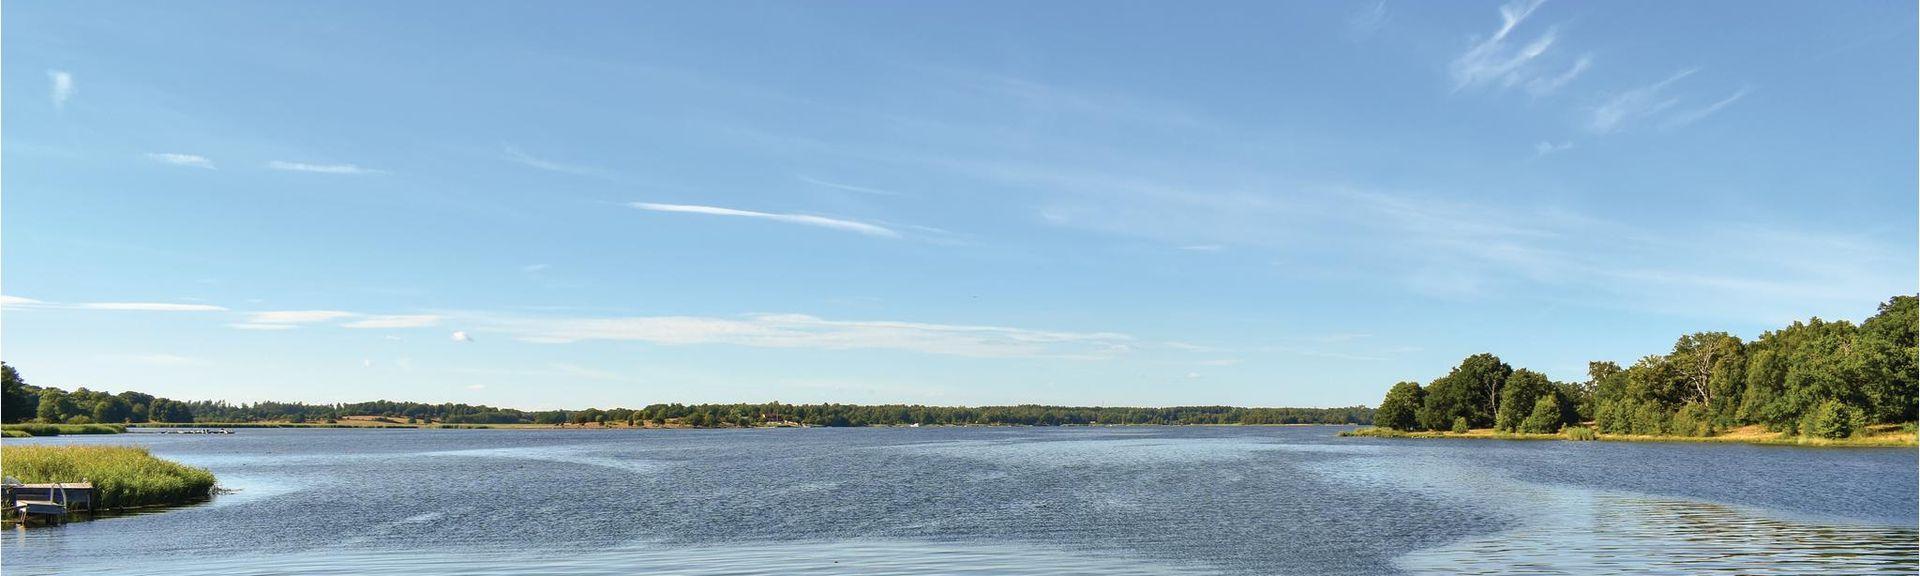 Gemeente Ronneby, Zweden